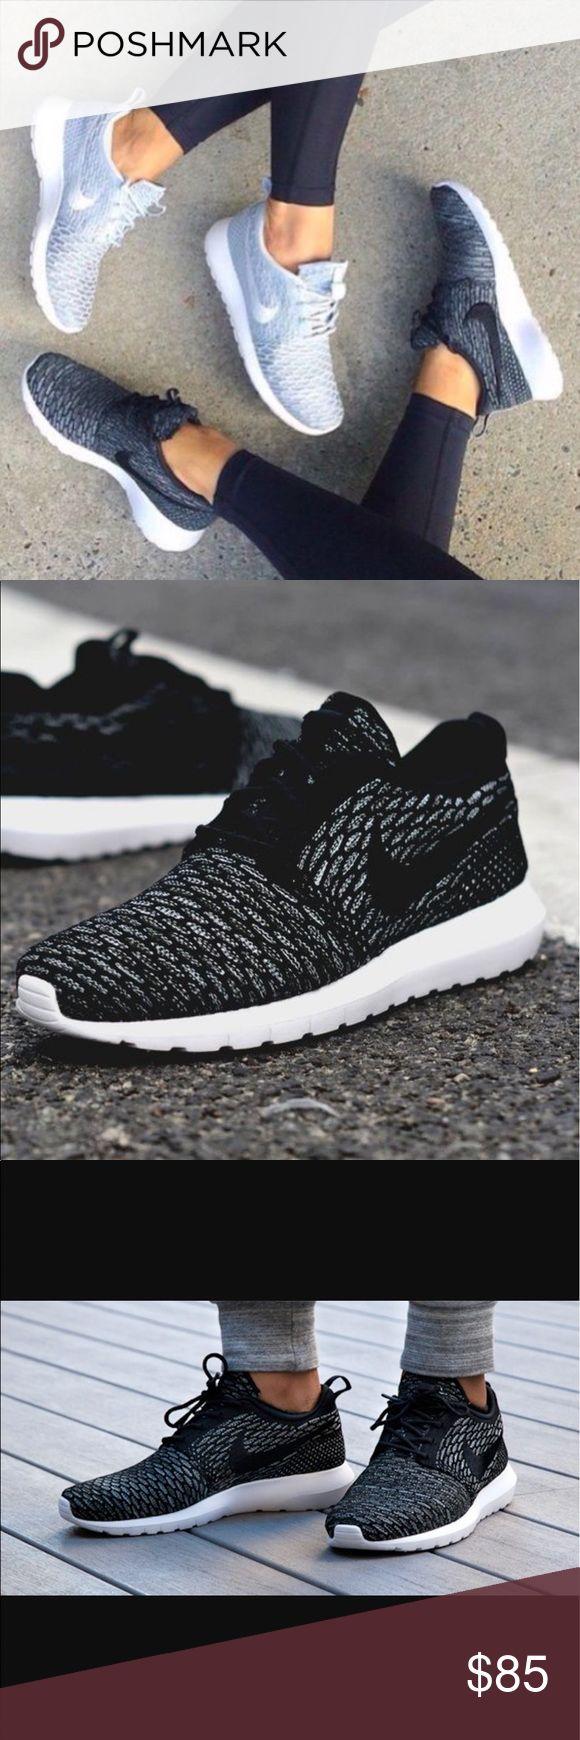 Nike fly knit roshe runs Gently worn! So cute! Nike Shoes Sneakers